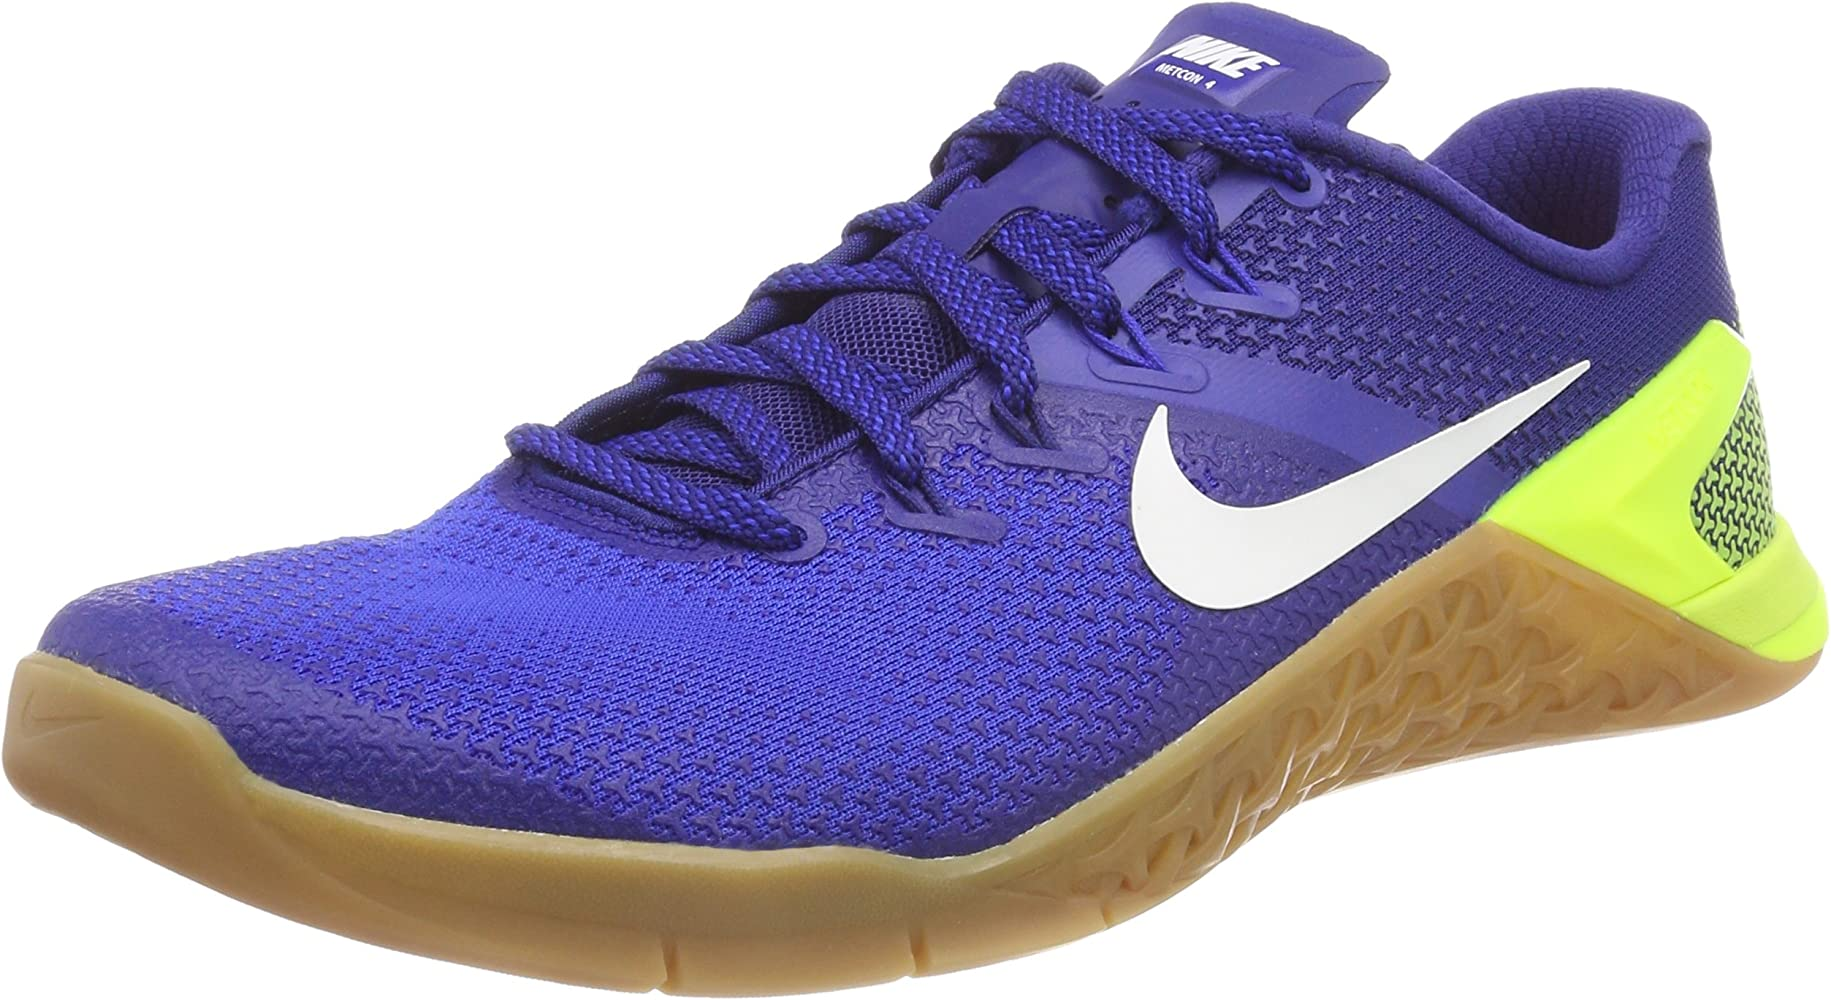 date de sortie: df7b2 2562e Nike Metcon 4, Chaussures de Running Compétition Homme ...